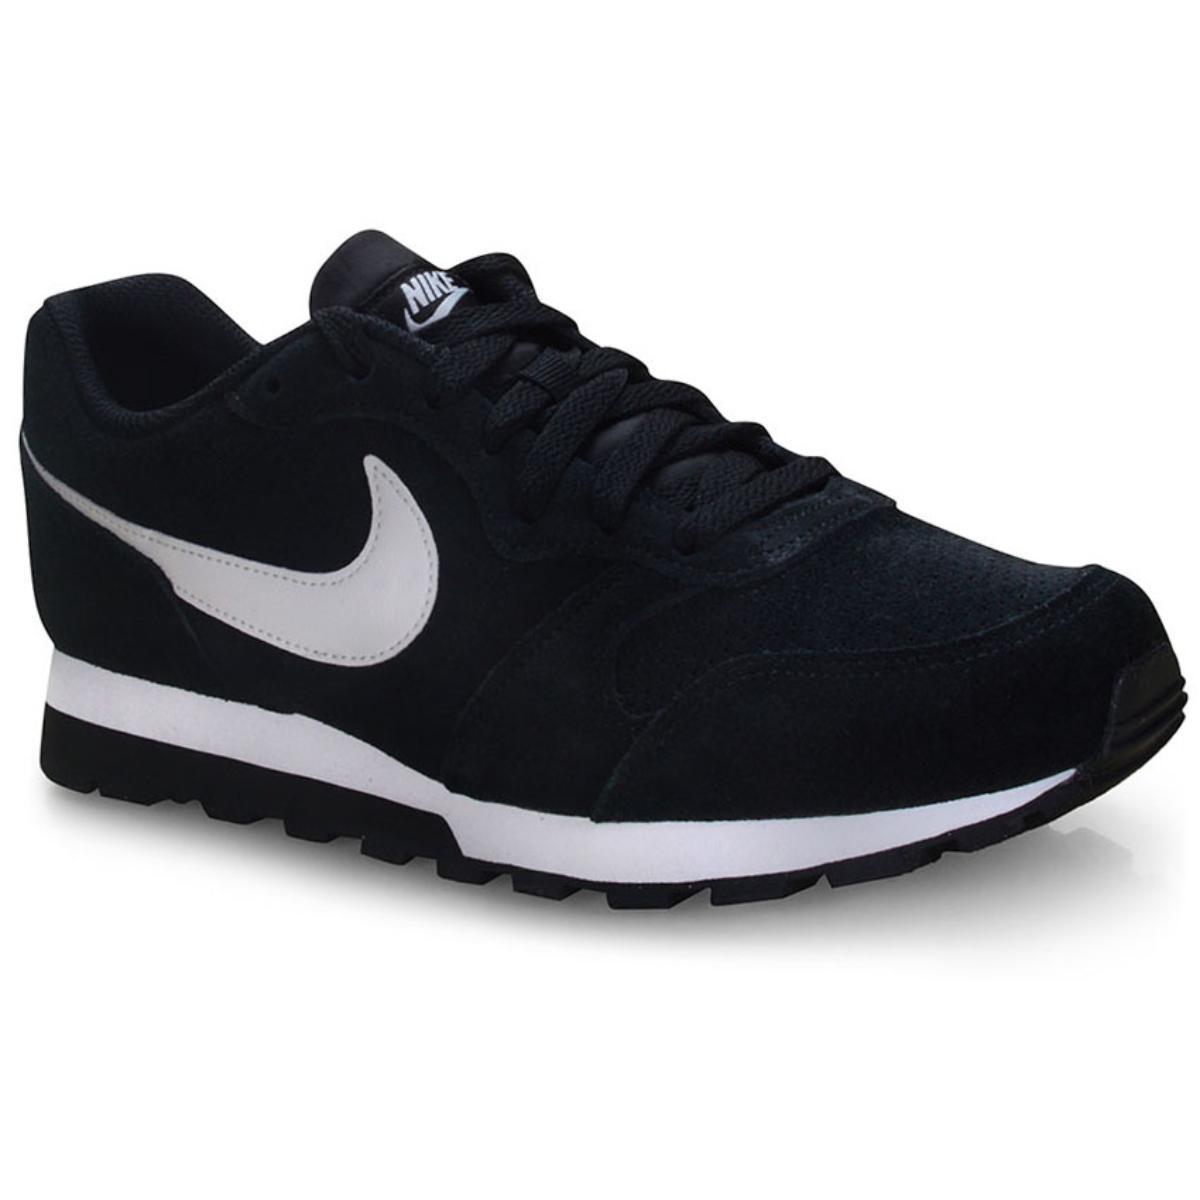 Tênis Masculino Nike Aq9211-004 md Runner 2 Suede Preto/branco